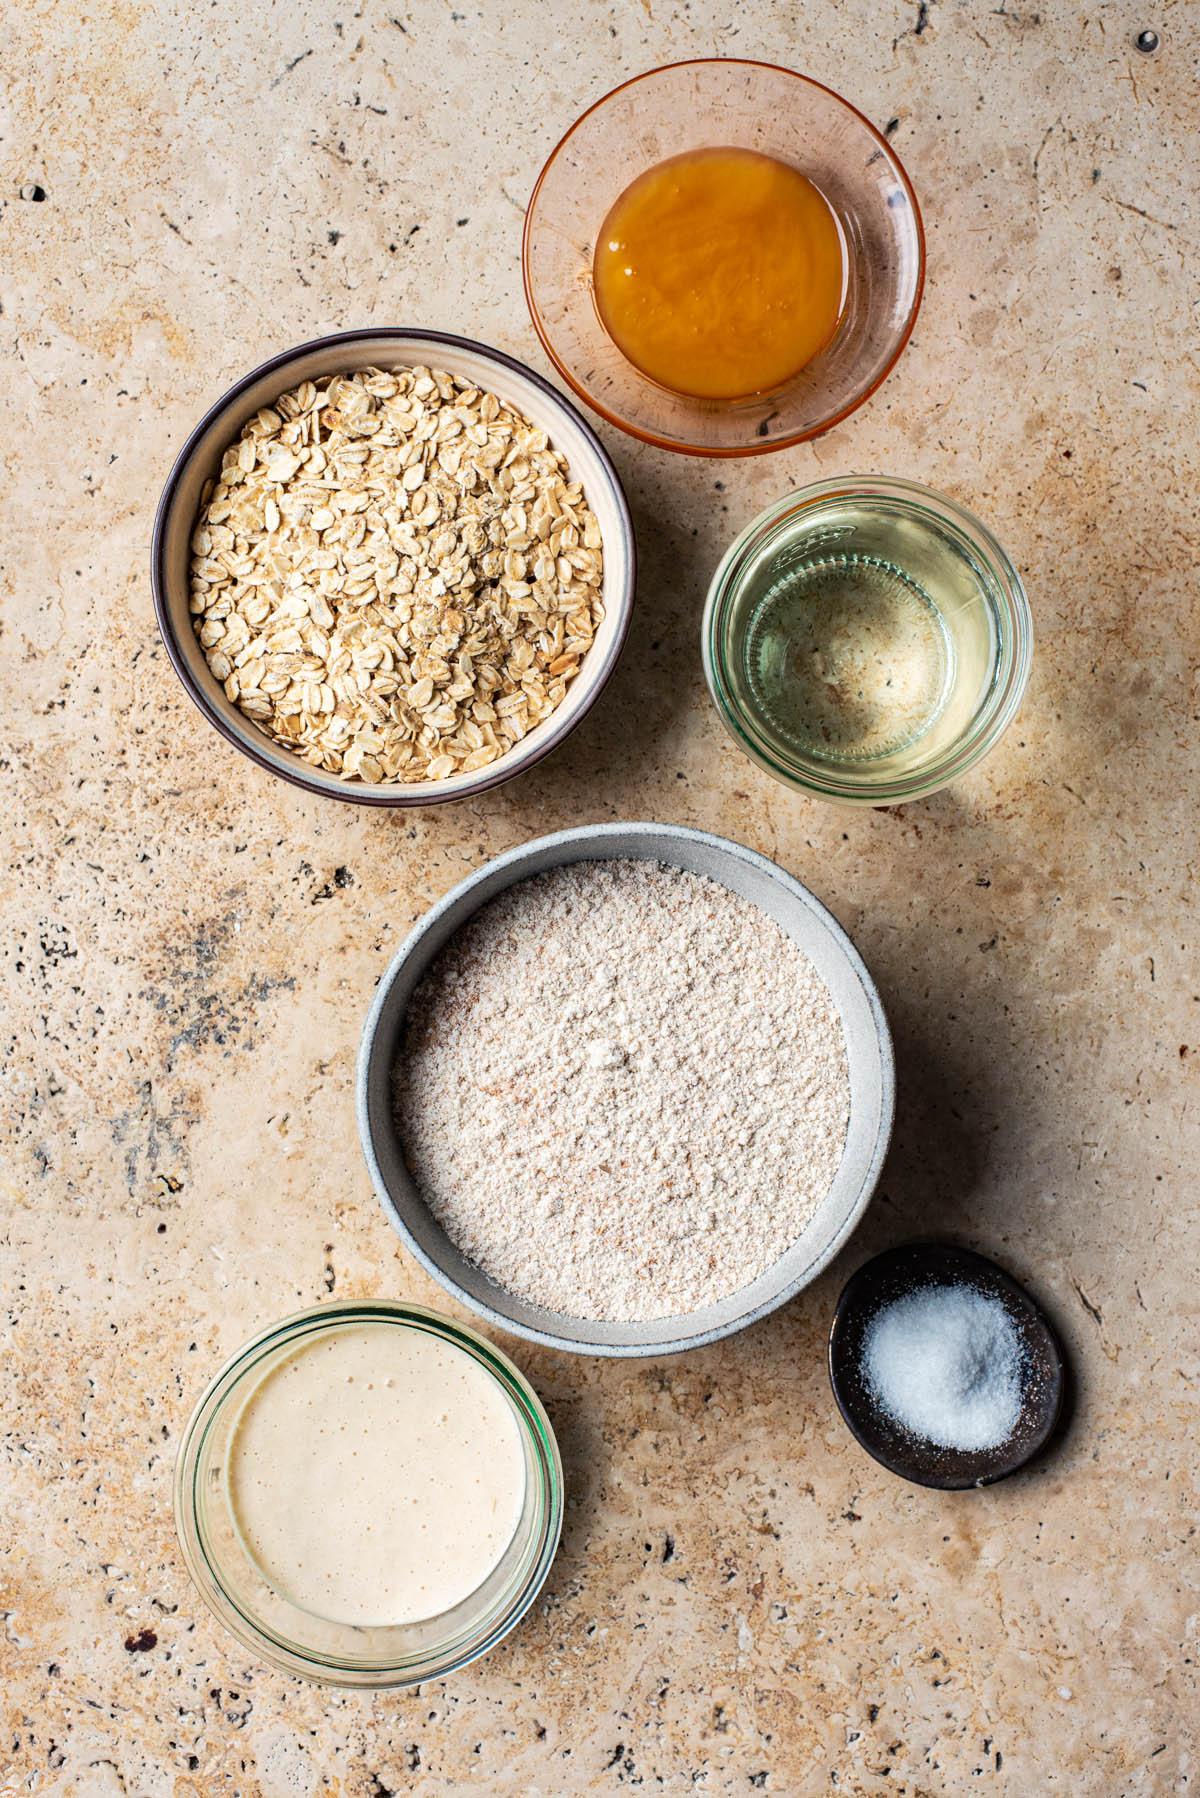 Honey and oat sourdough spelt bread ingredients.